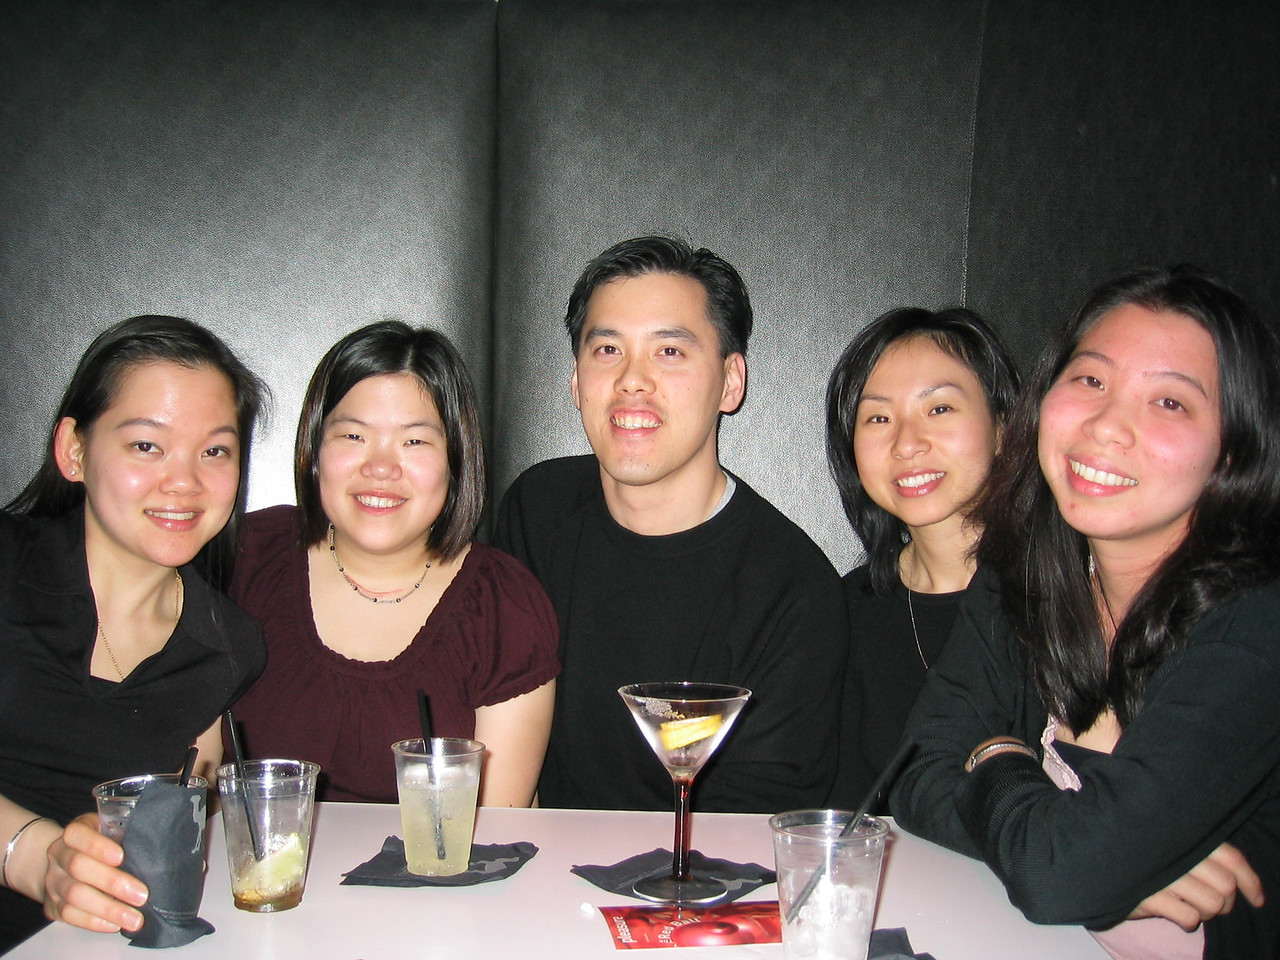 Joann, Veronica, Benny, Helen, & Grace @ SnoDrift, Thursday 2-20-2003